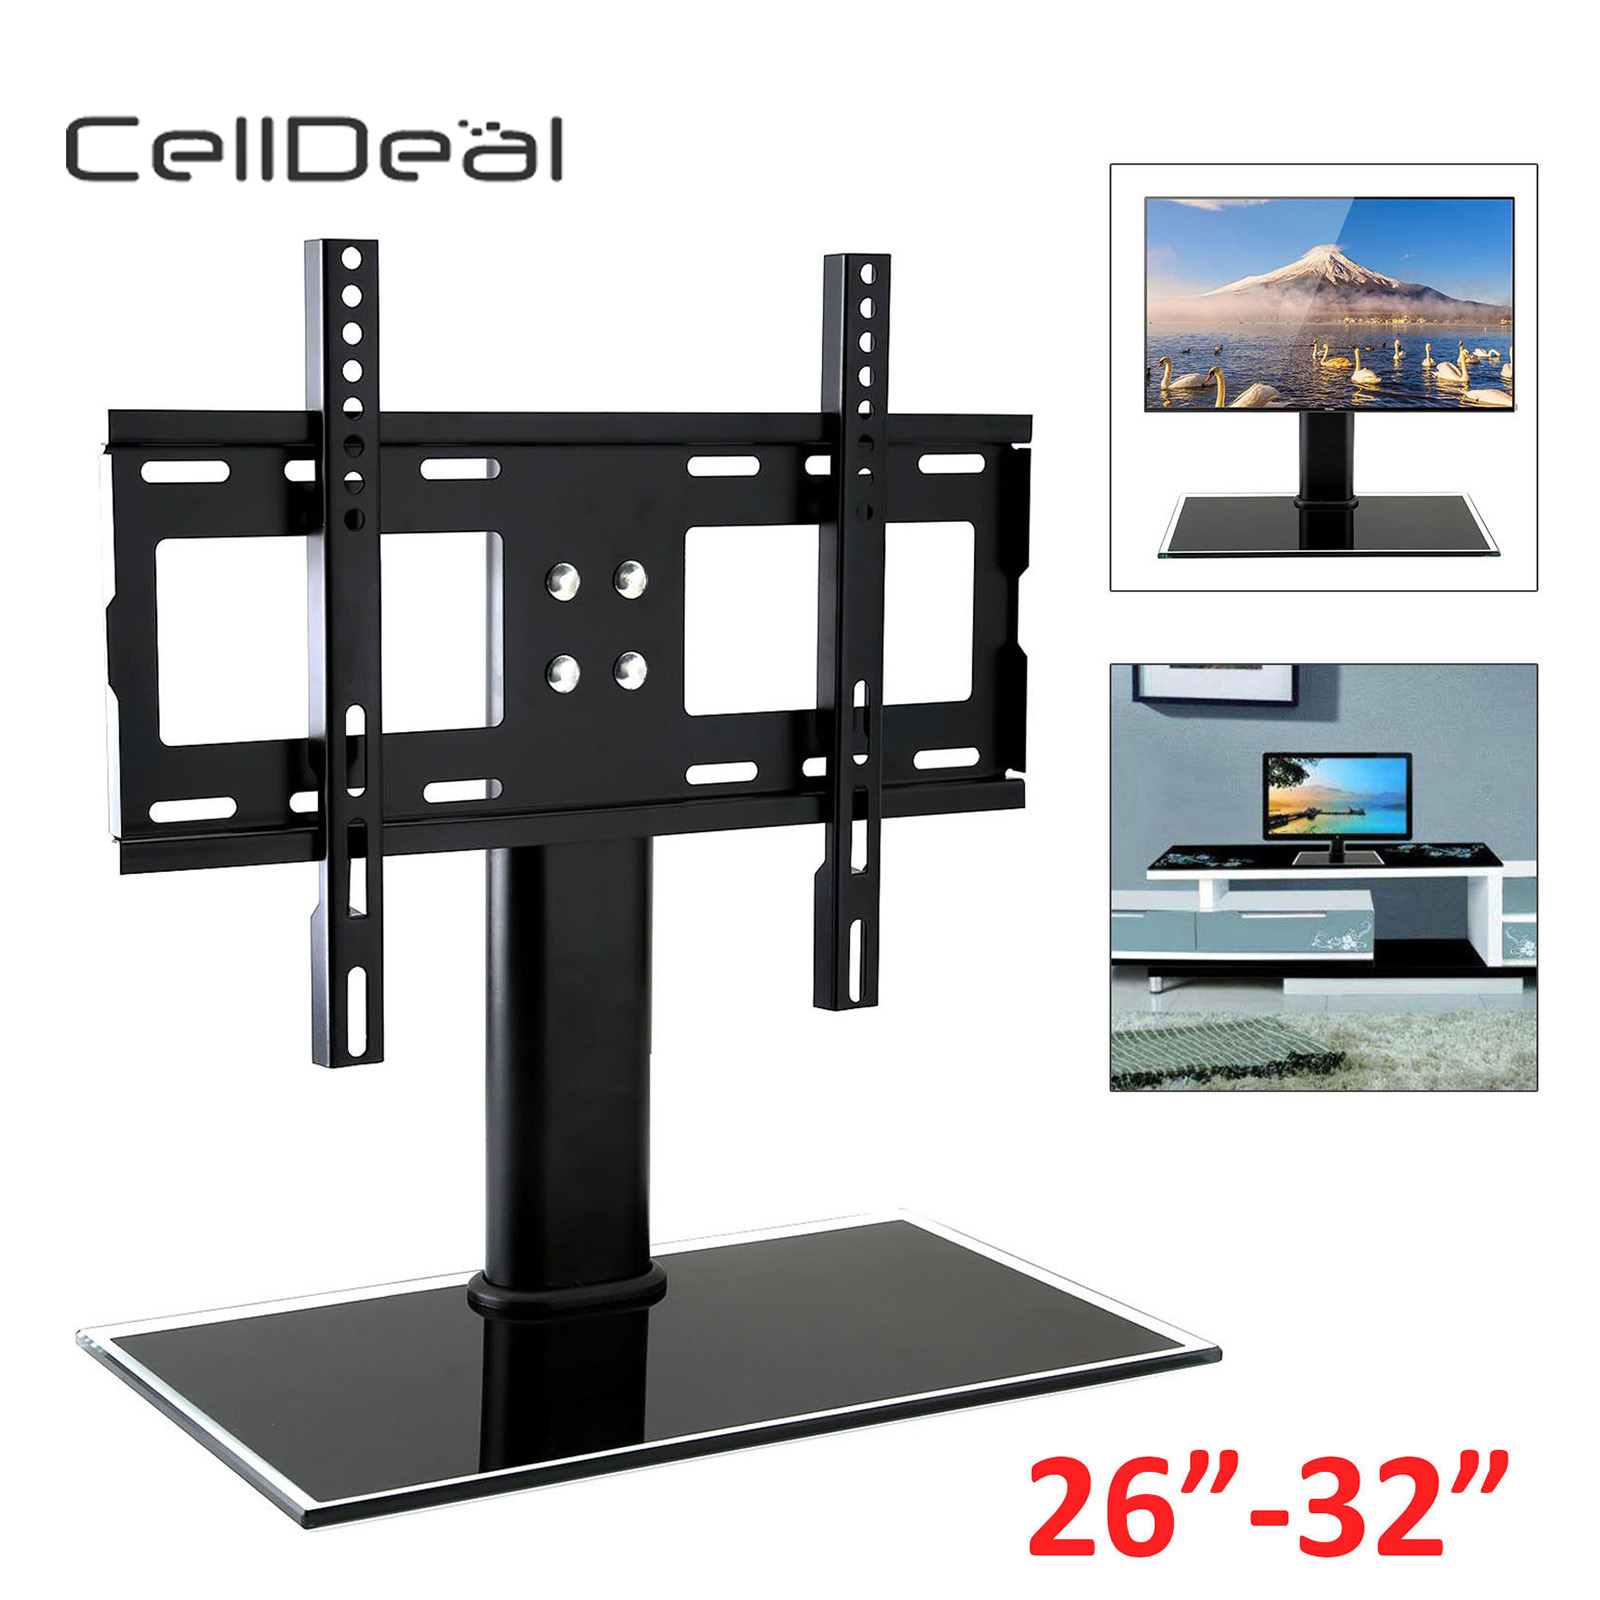 26-32 Universal Table TV Stand Bracket Pedestal LED LCD VESA Mount Metal Hanger for Frames26-32 Universal Table TV Stand Bracket Pedestal LED LCD VESA Mount Metal Hanger for Frames